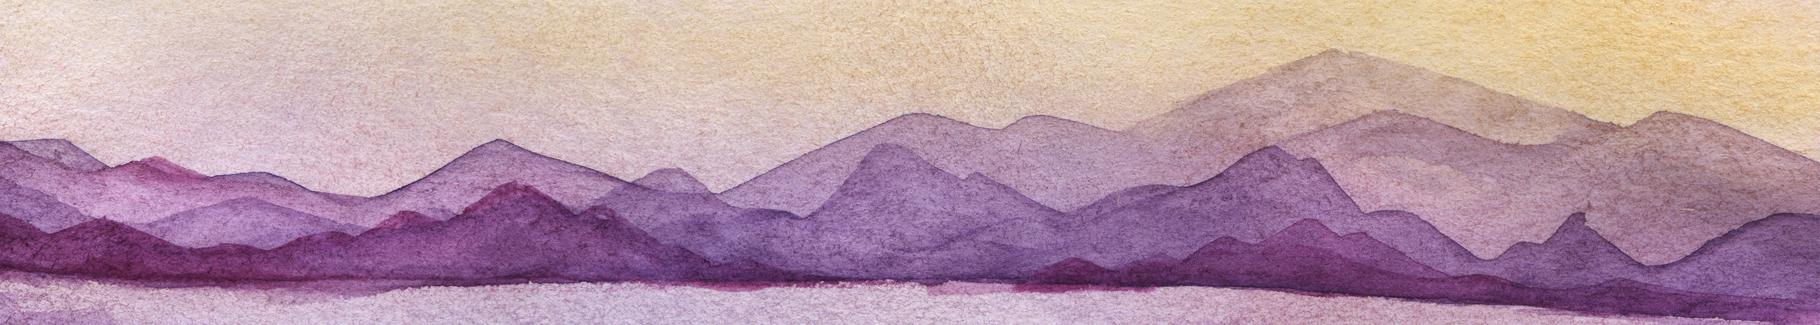 Obraz akwarela w pastelach